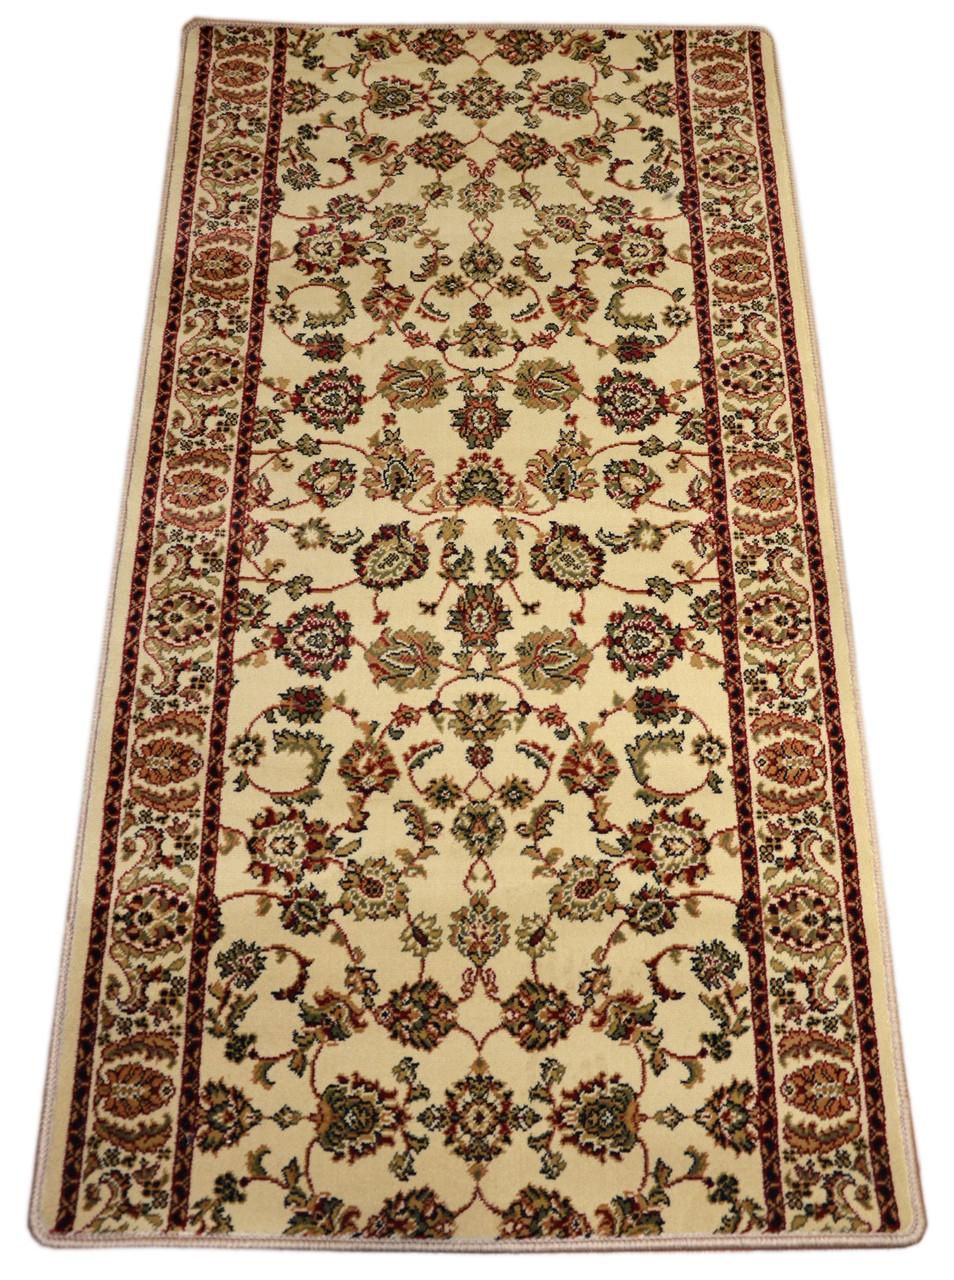 Dean Elegant Keshan Antique Carpet Rug Runner 31 Inches